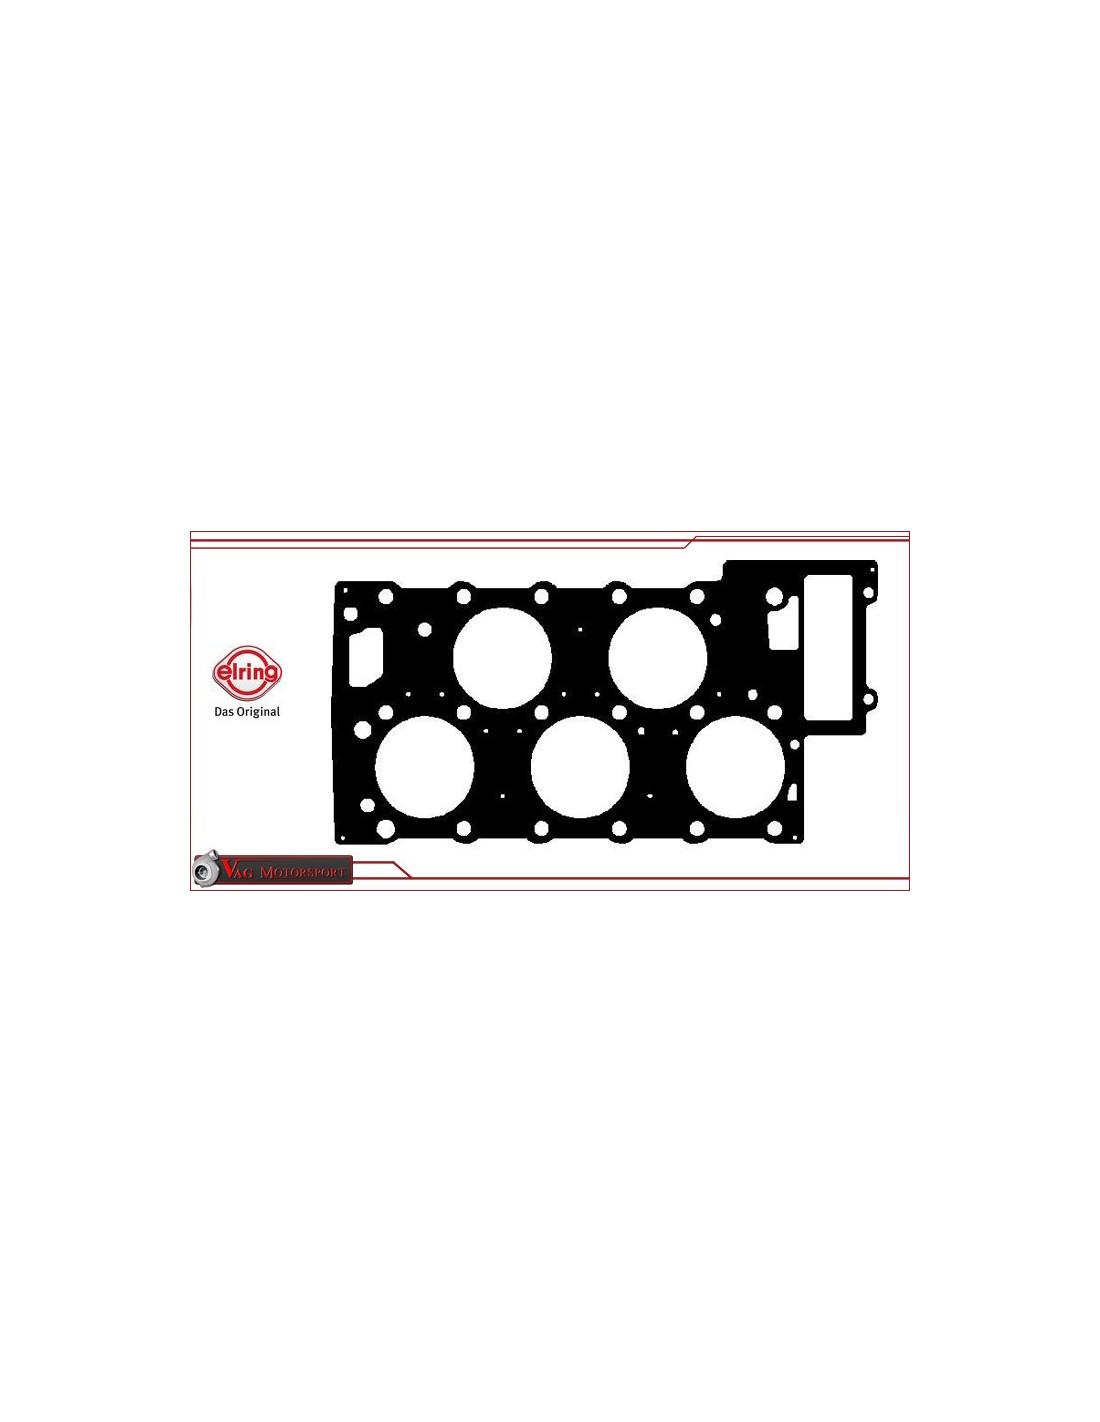 joint de culasse elring agz vr5 v5 golf4 toledo passat bora. Black Bedroom Furniture Sets. Home Design Ideas